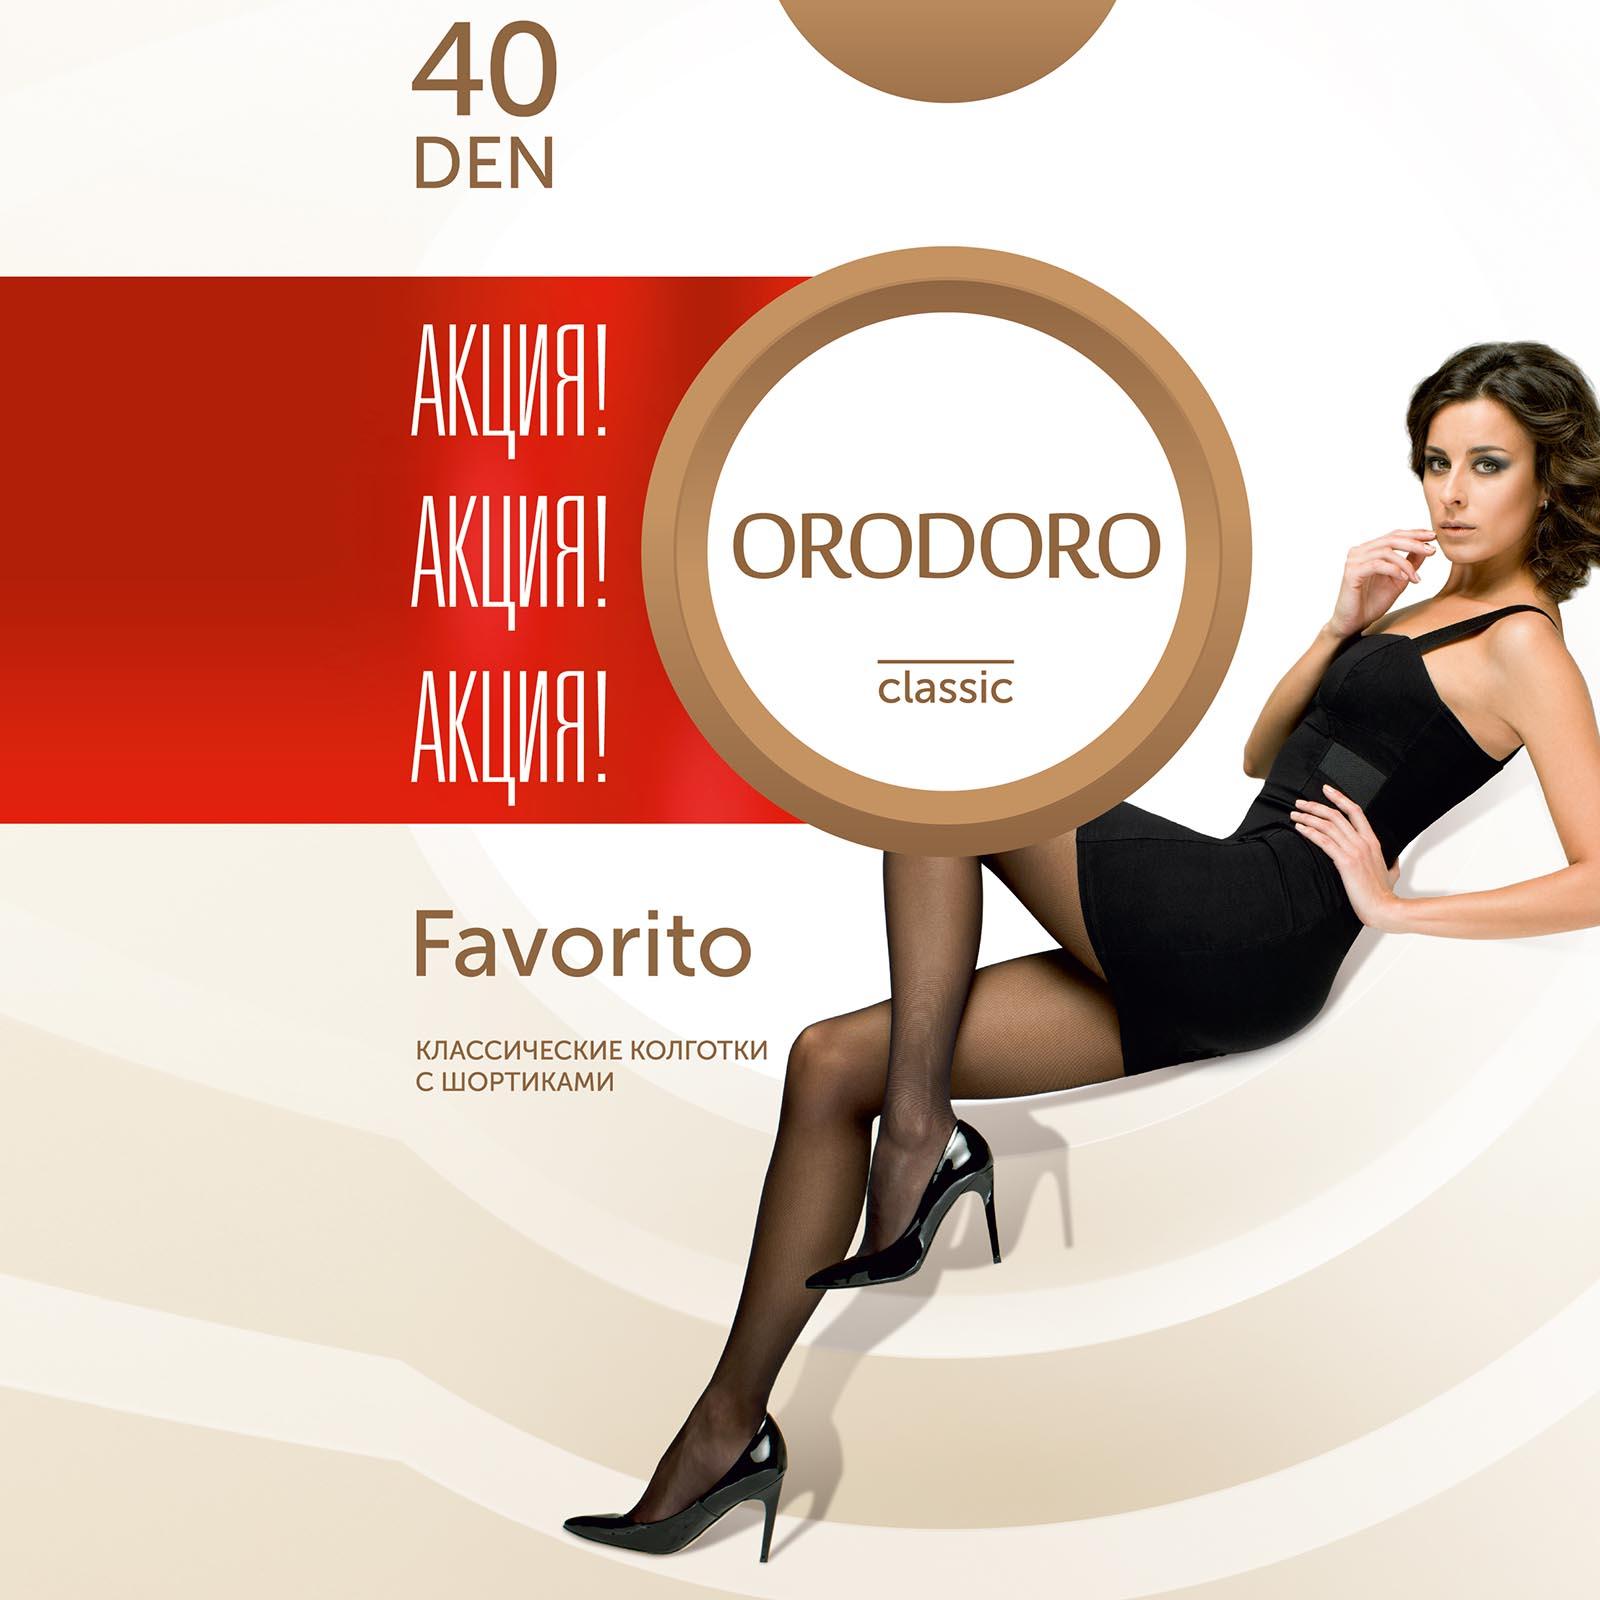 �������� �������� c �������� ��������� Orodoro 40 den